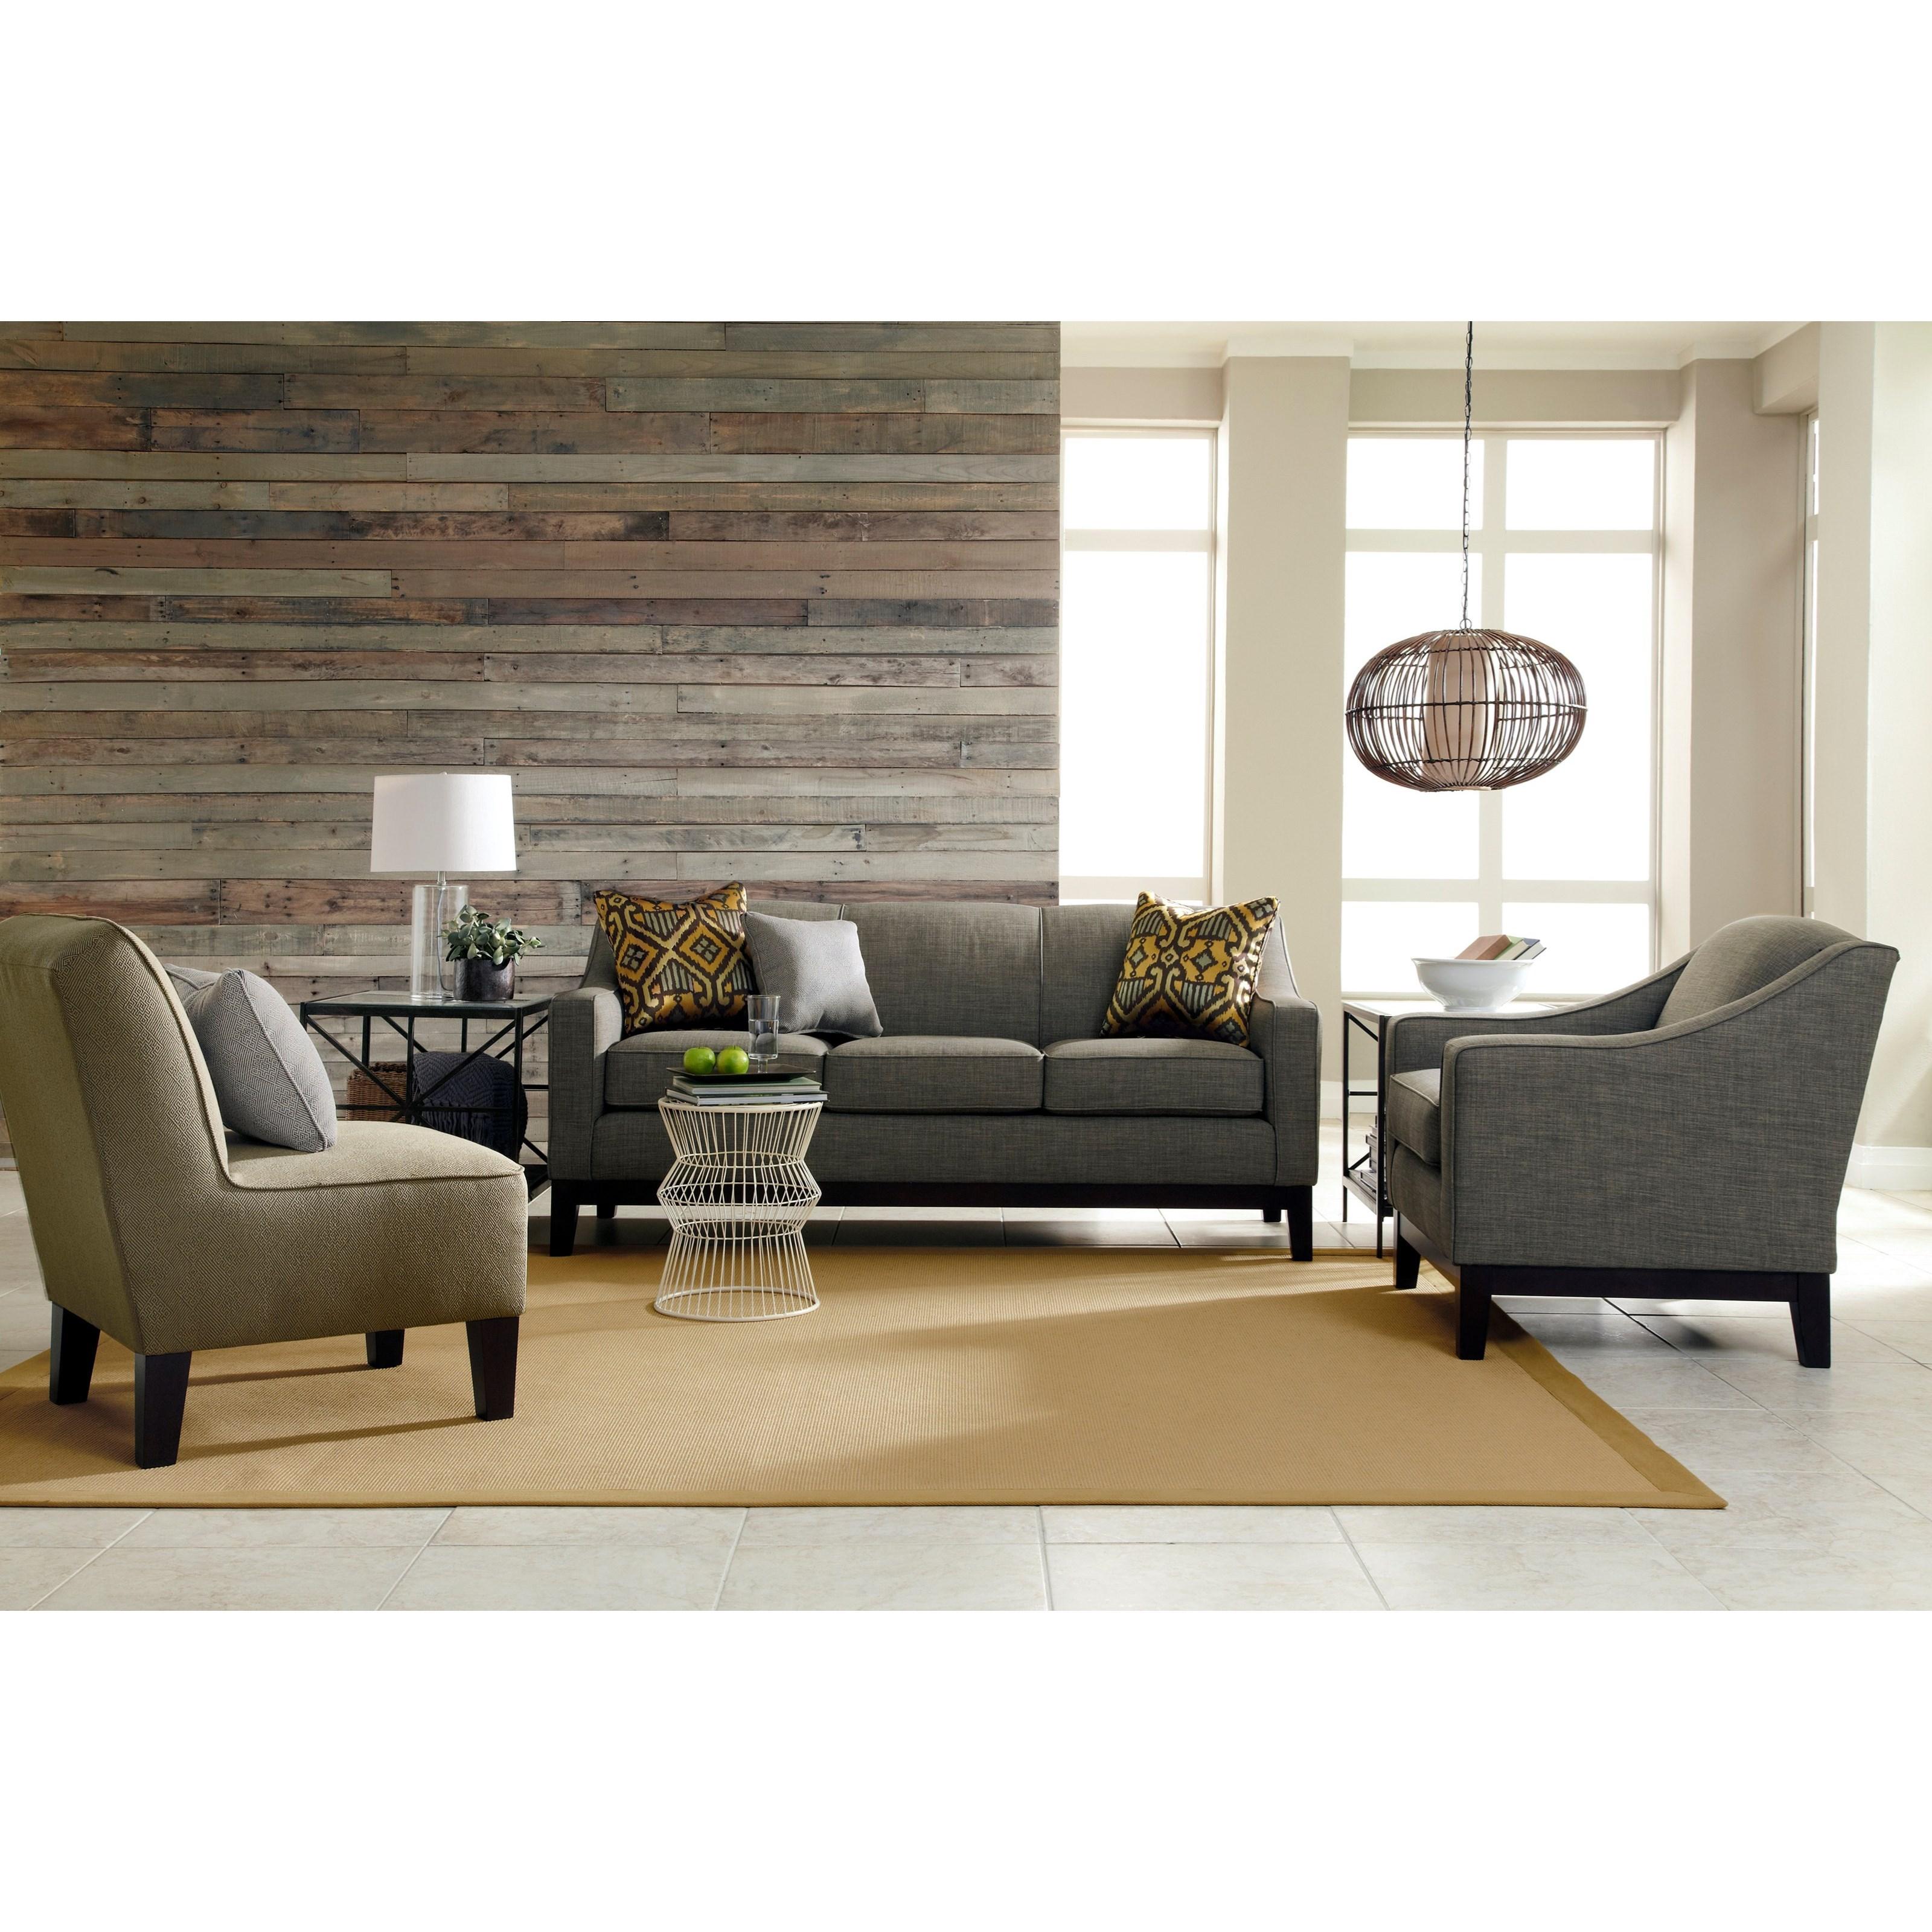 "Home Best Furniture: Best Home Furnishings Emeline S91E Customizable 84"" Sofa"